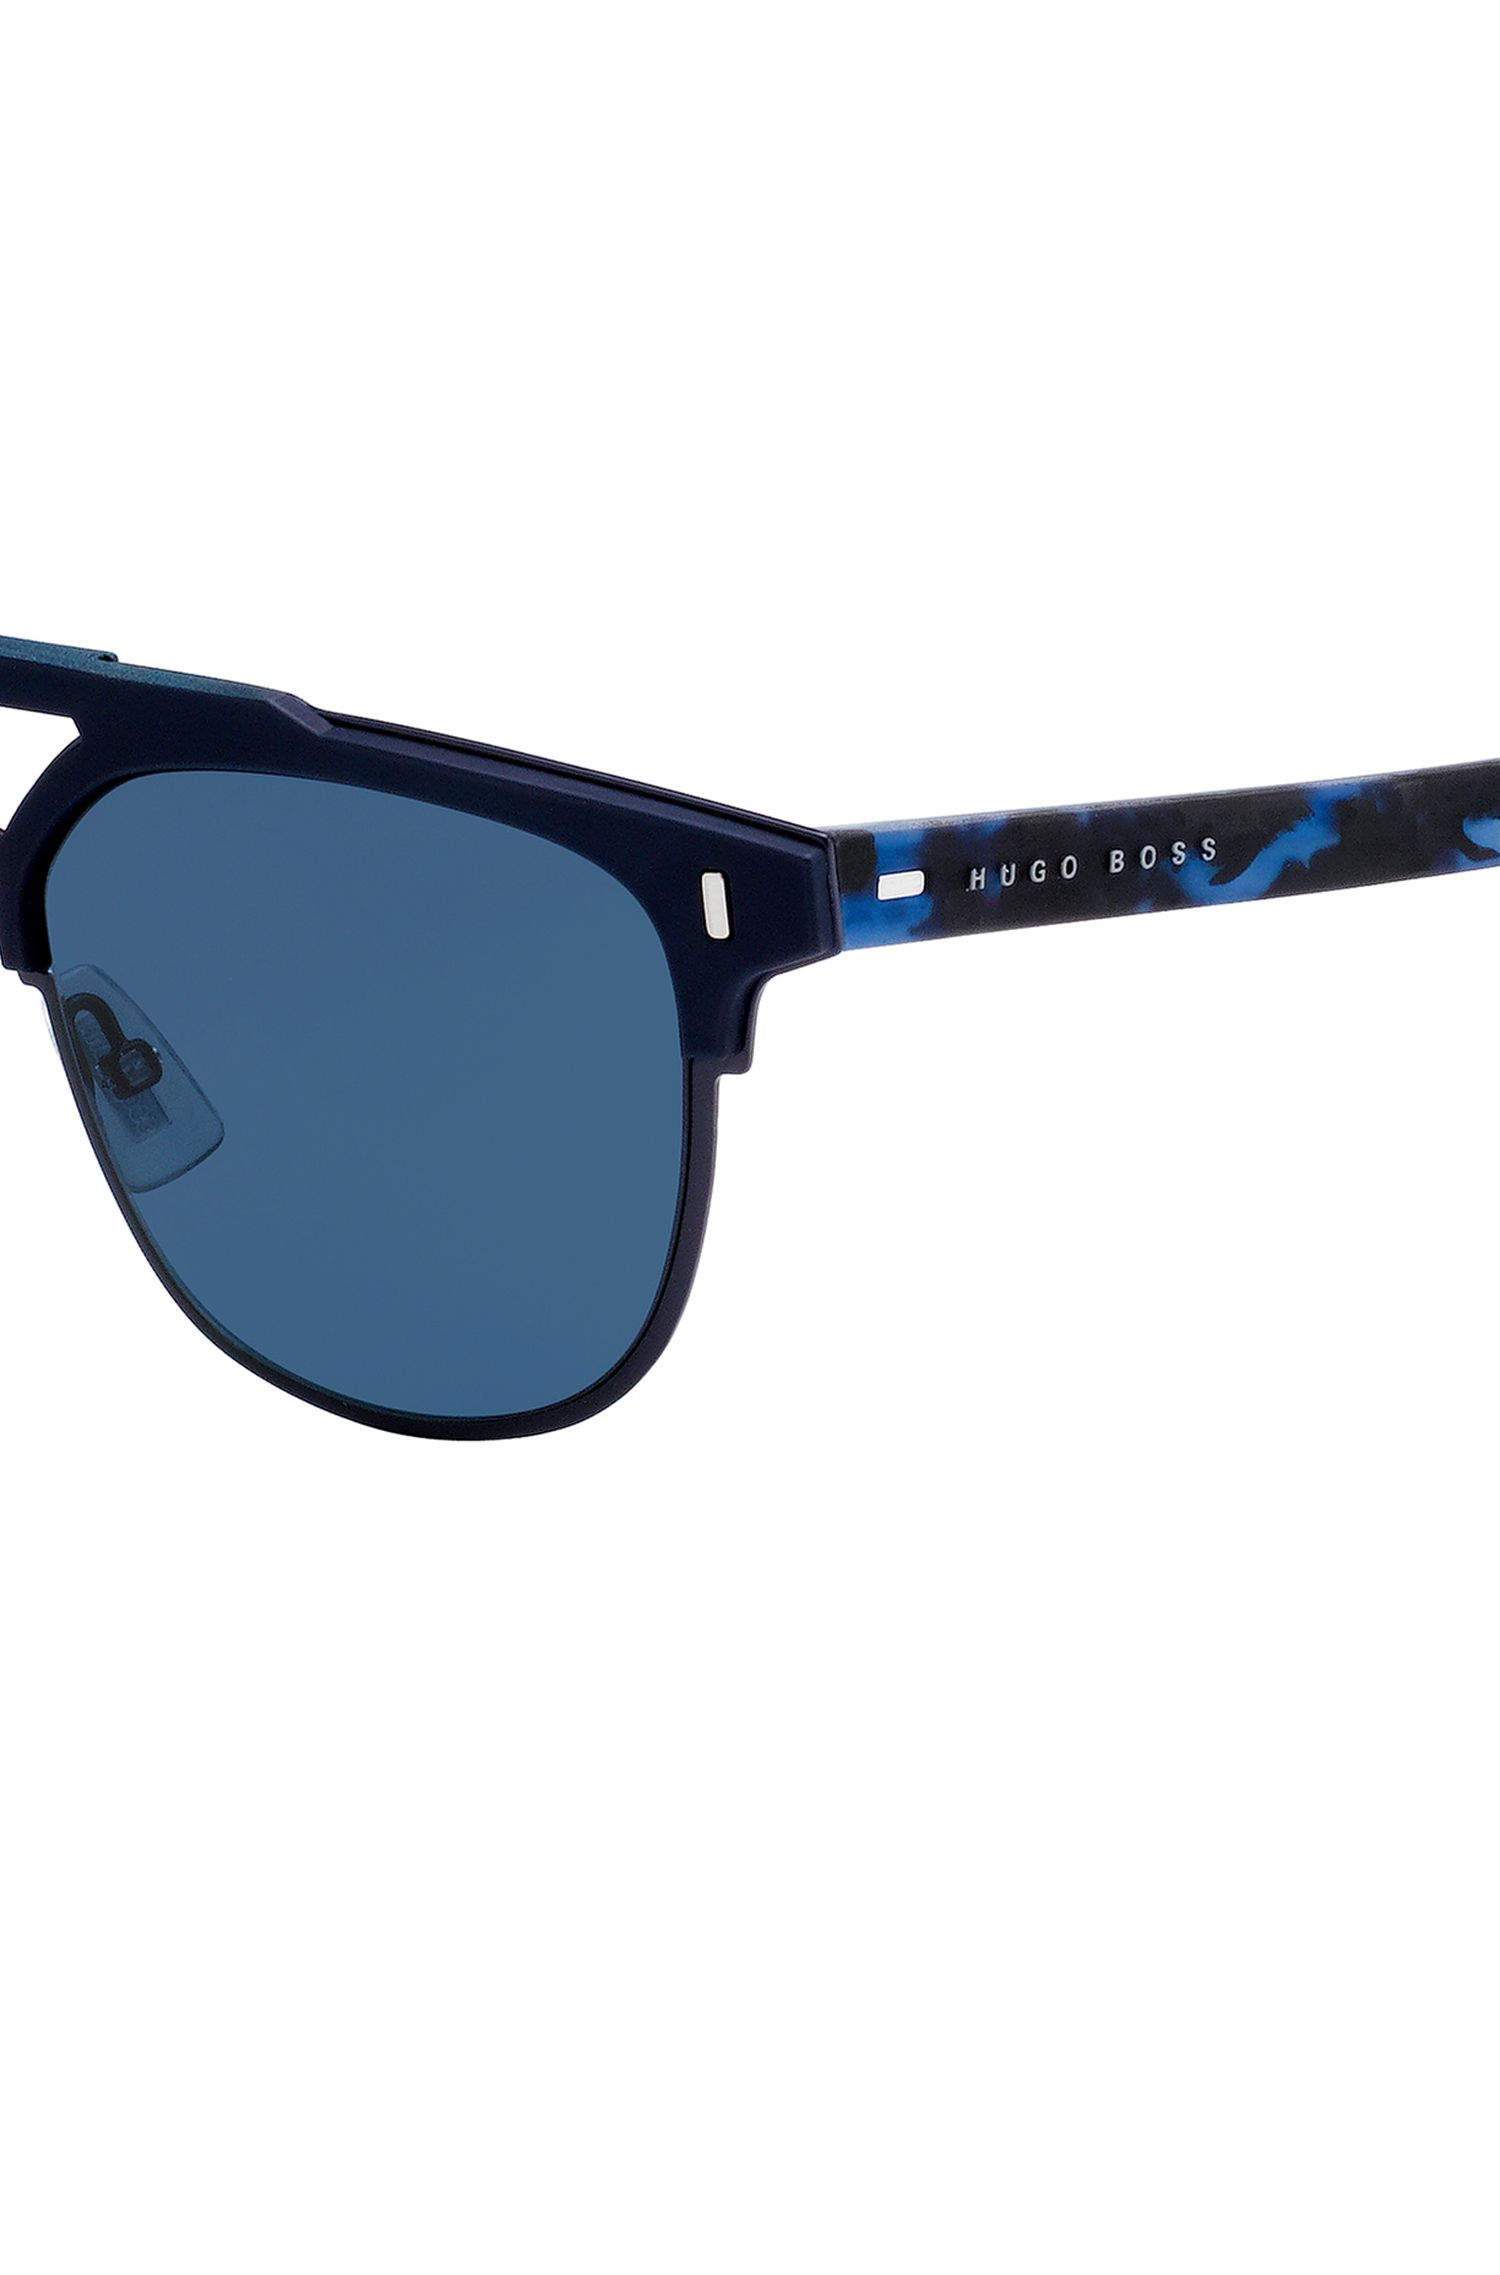 Matt-blue sunglasses with rubberised Havana temples, Blue